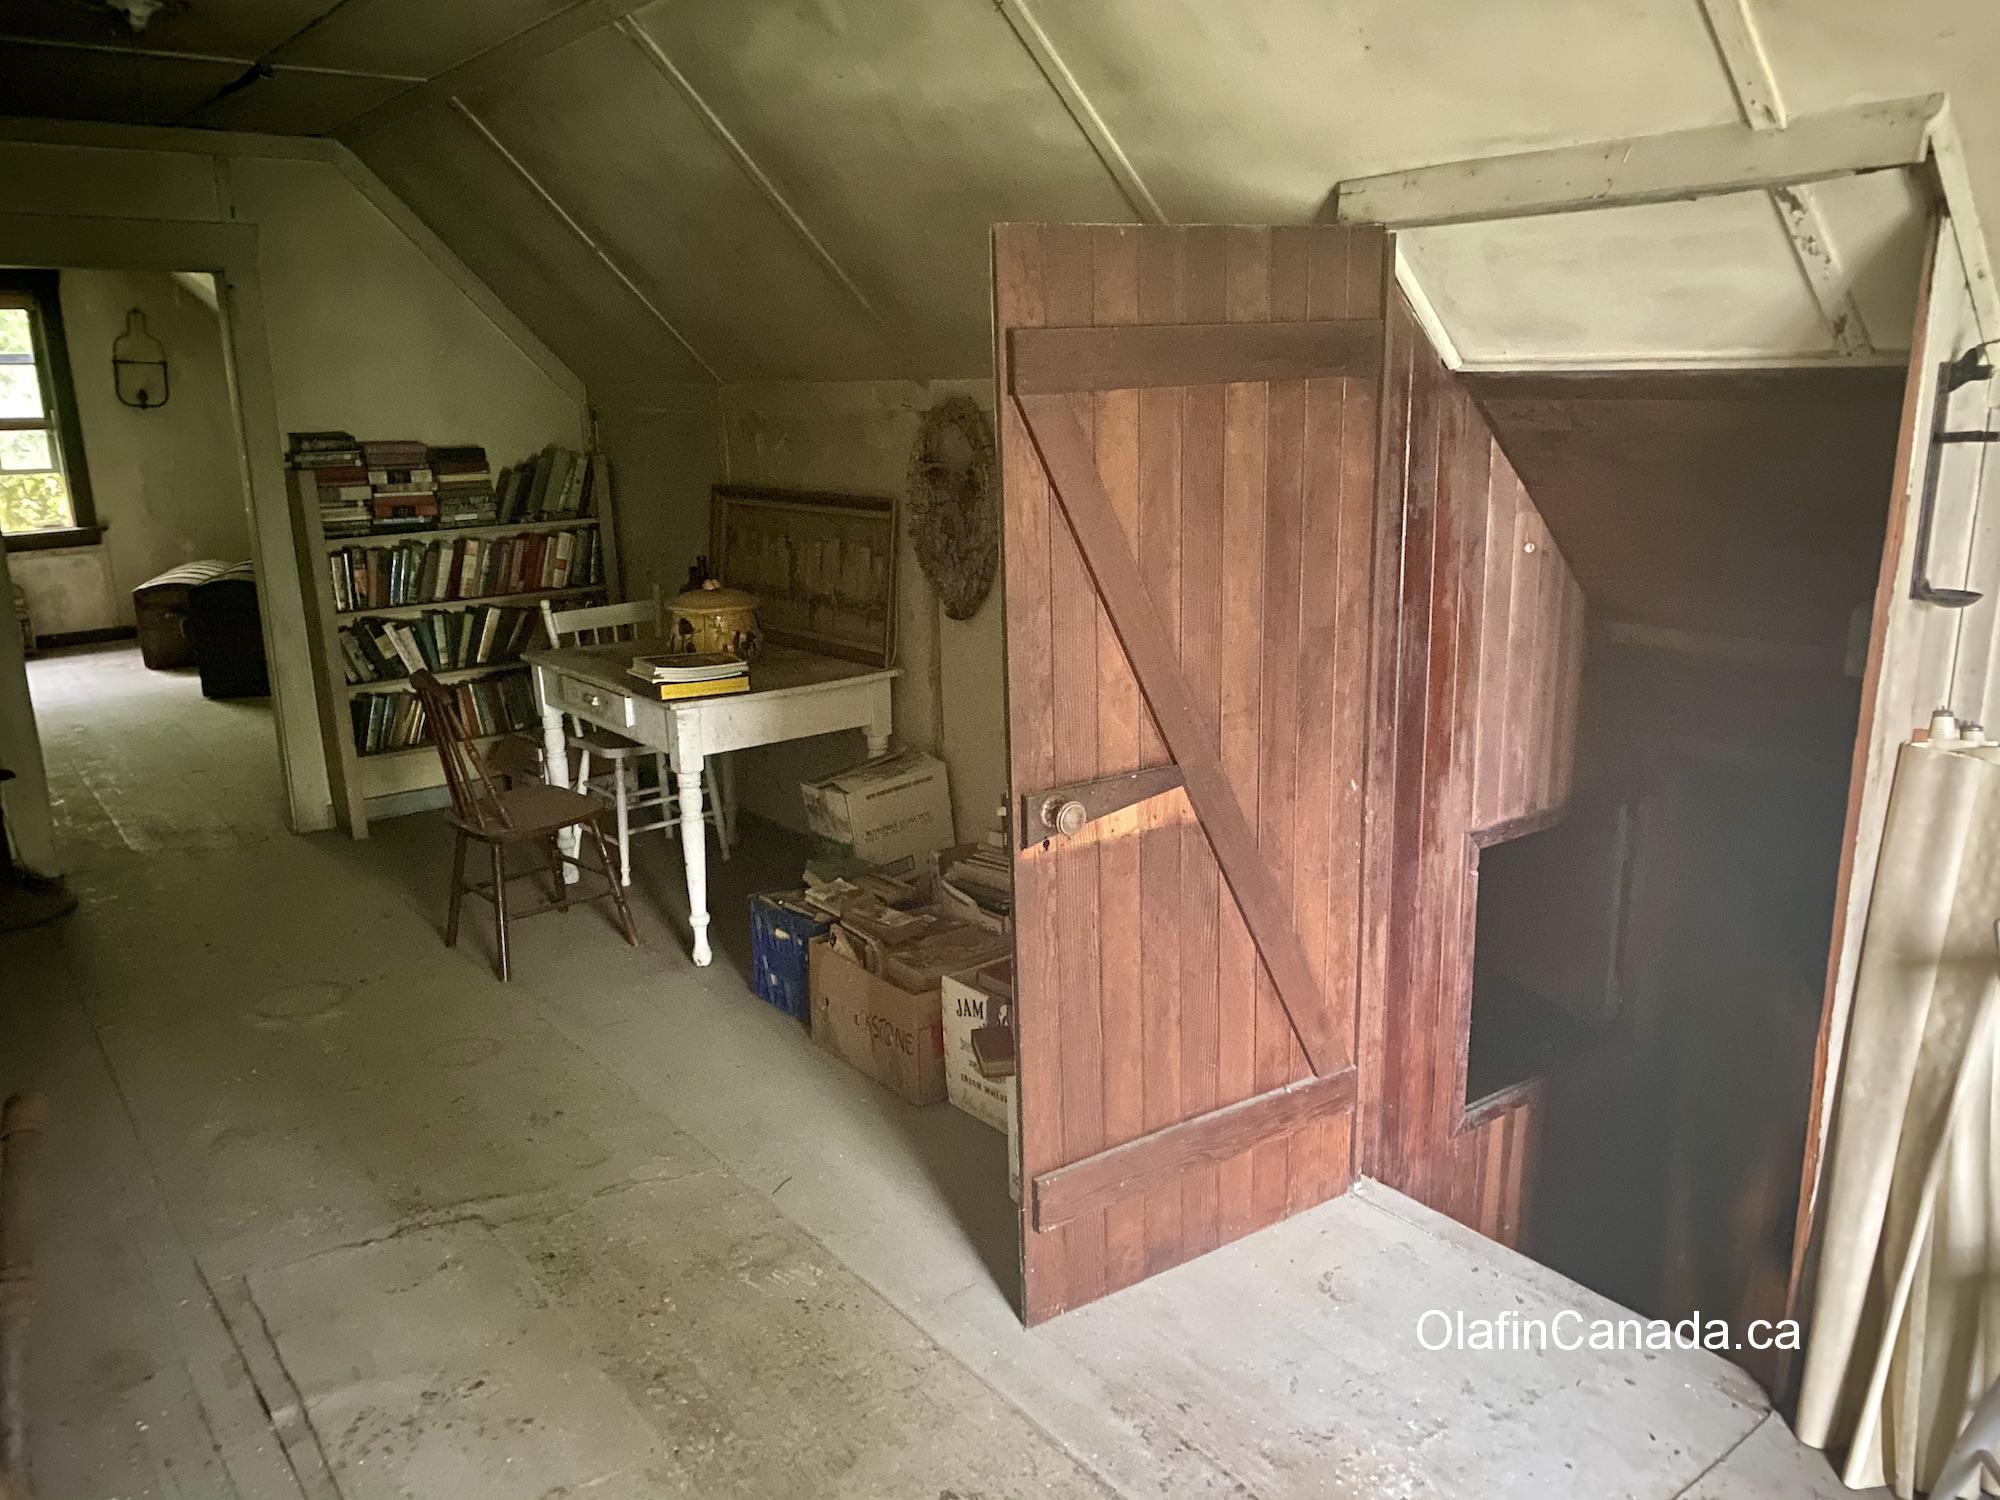 Interior of the living room above the classroom. #olafincanada #britishcolumbia #discoverbc #abandonedbc #alicearm